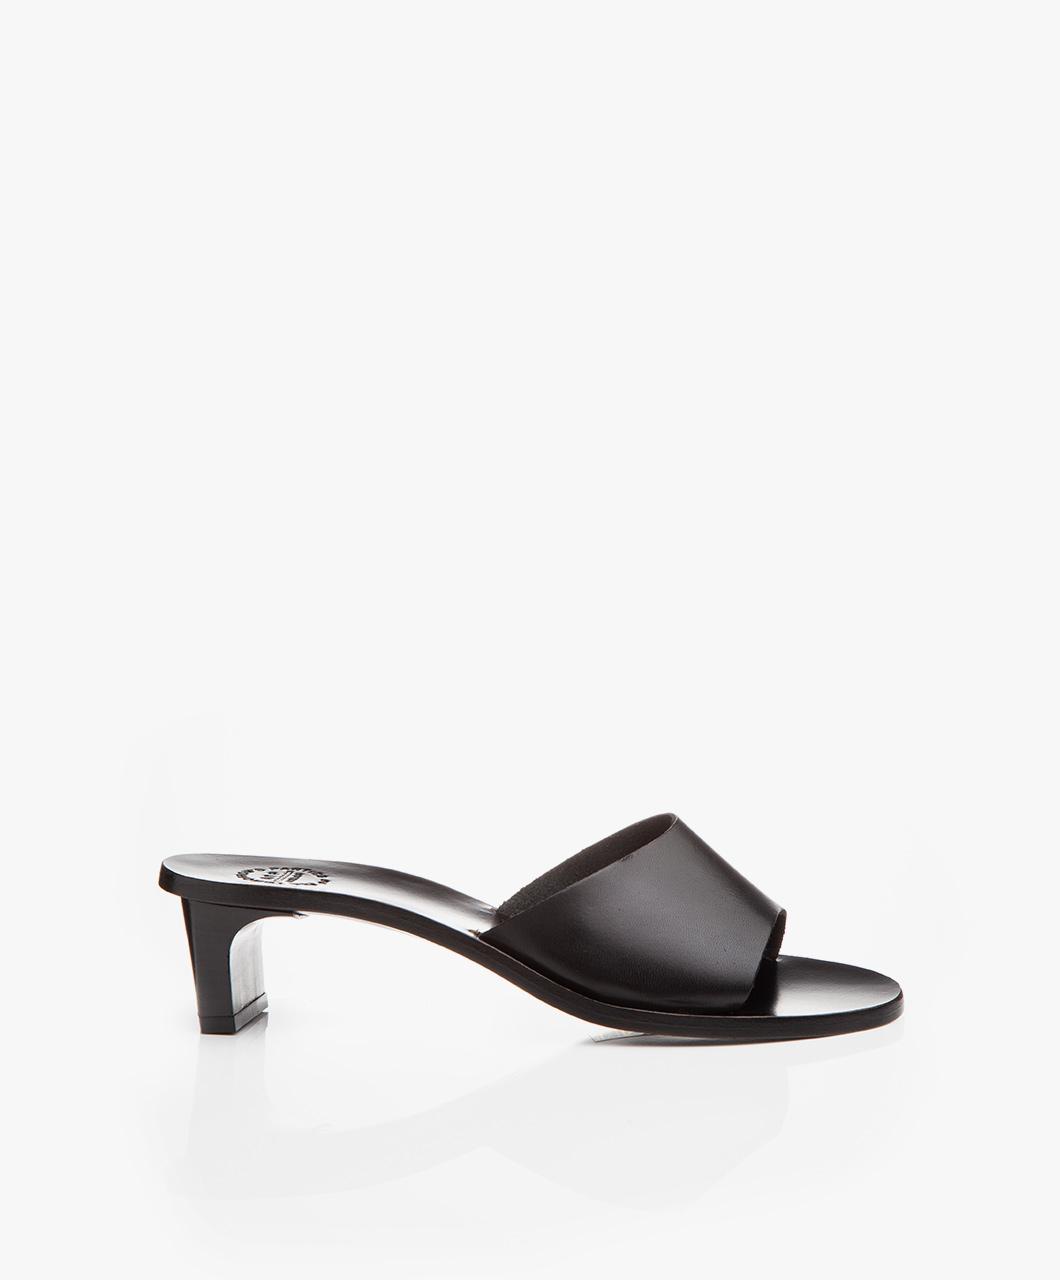 Immagine di ATP Atelier Mules Black Peonia Vachetta Leather